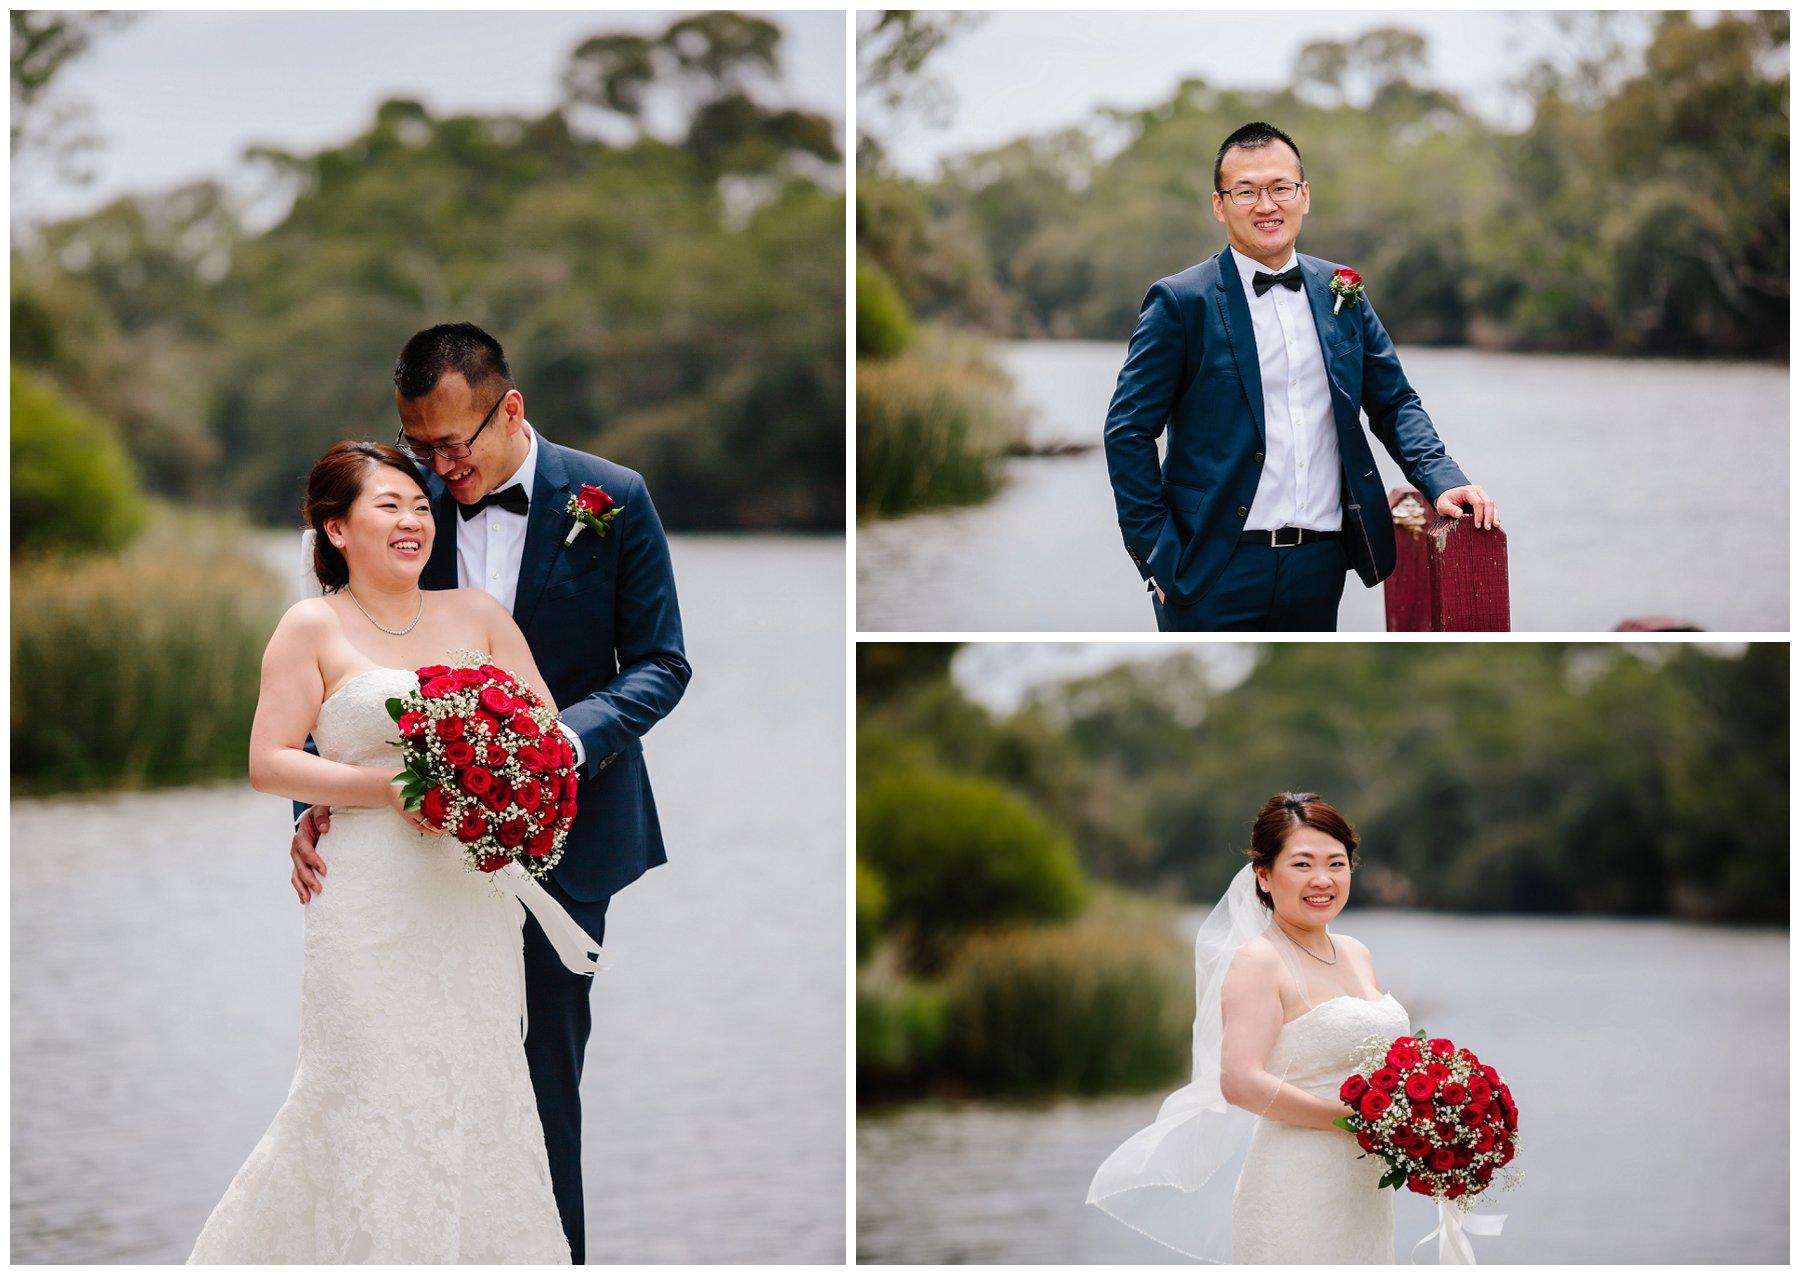 Swan Valley wedding open day